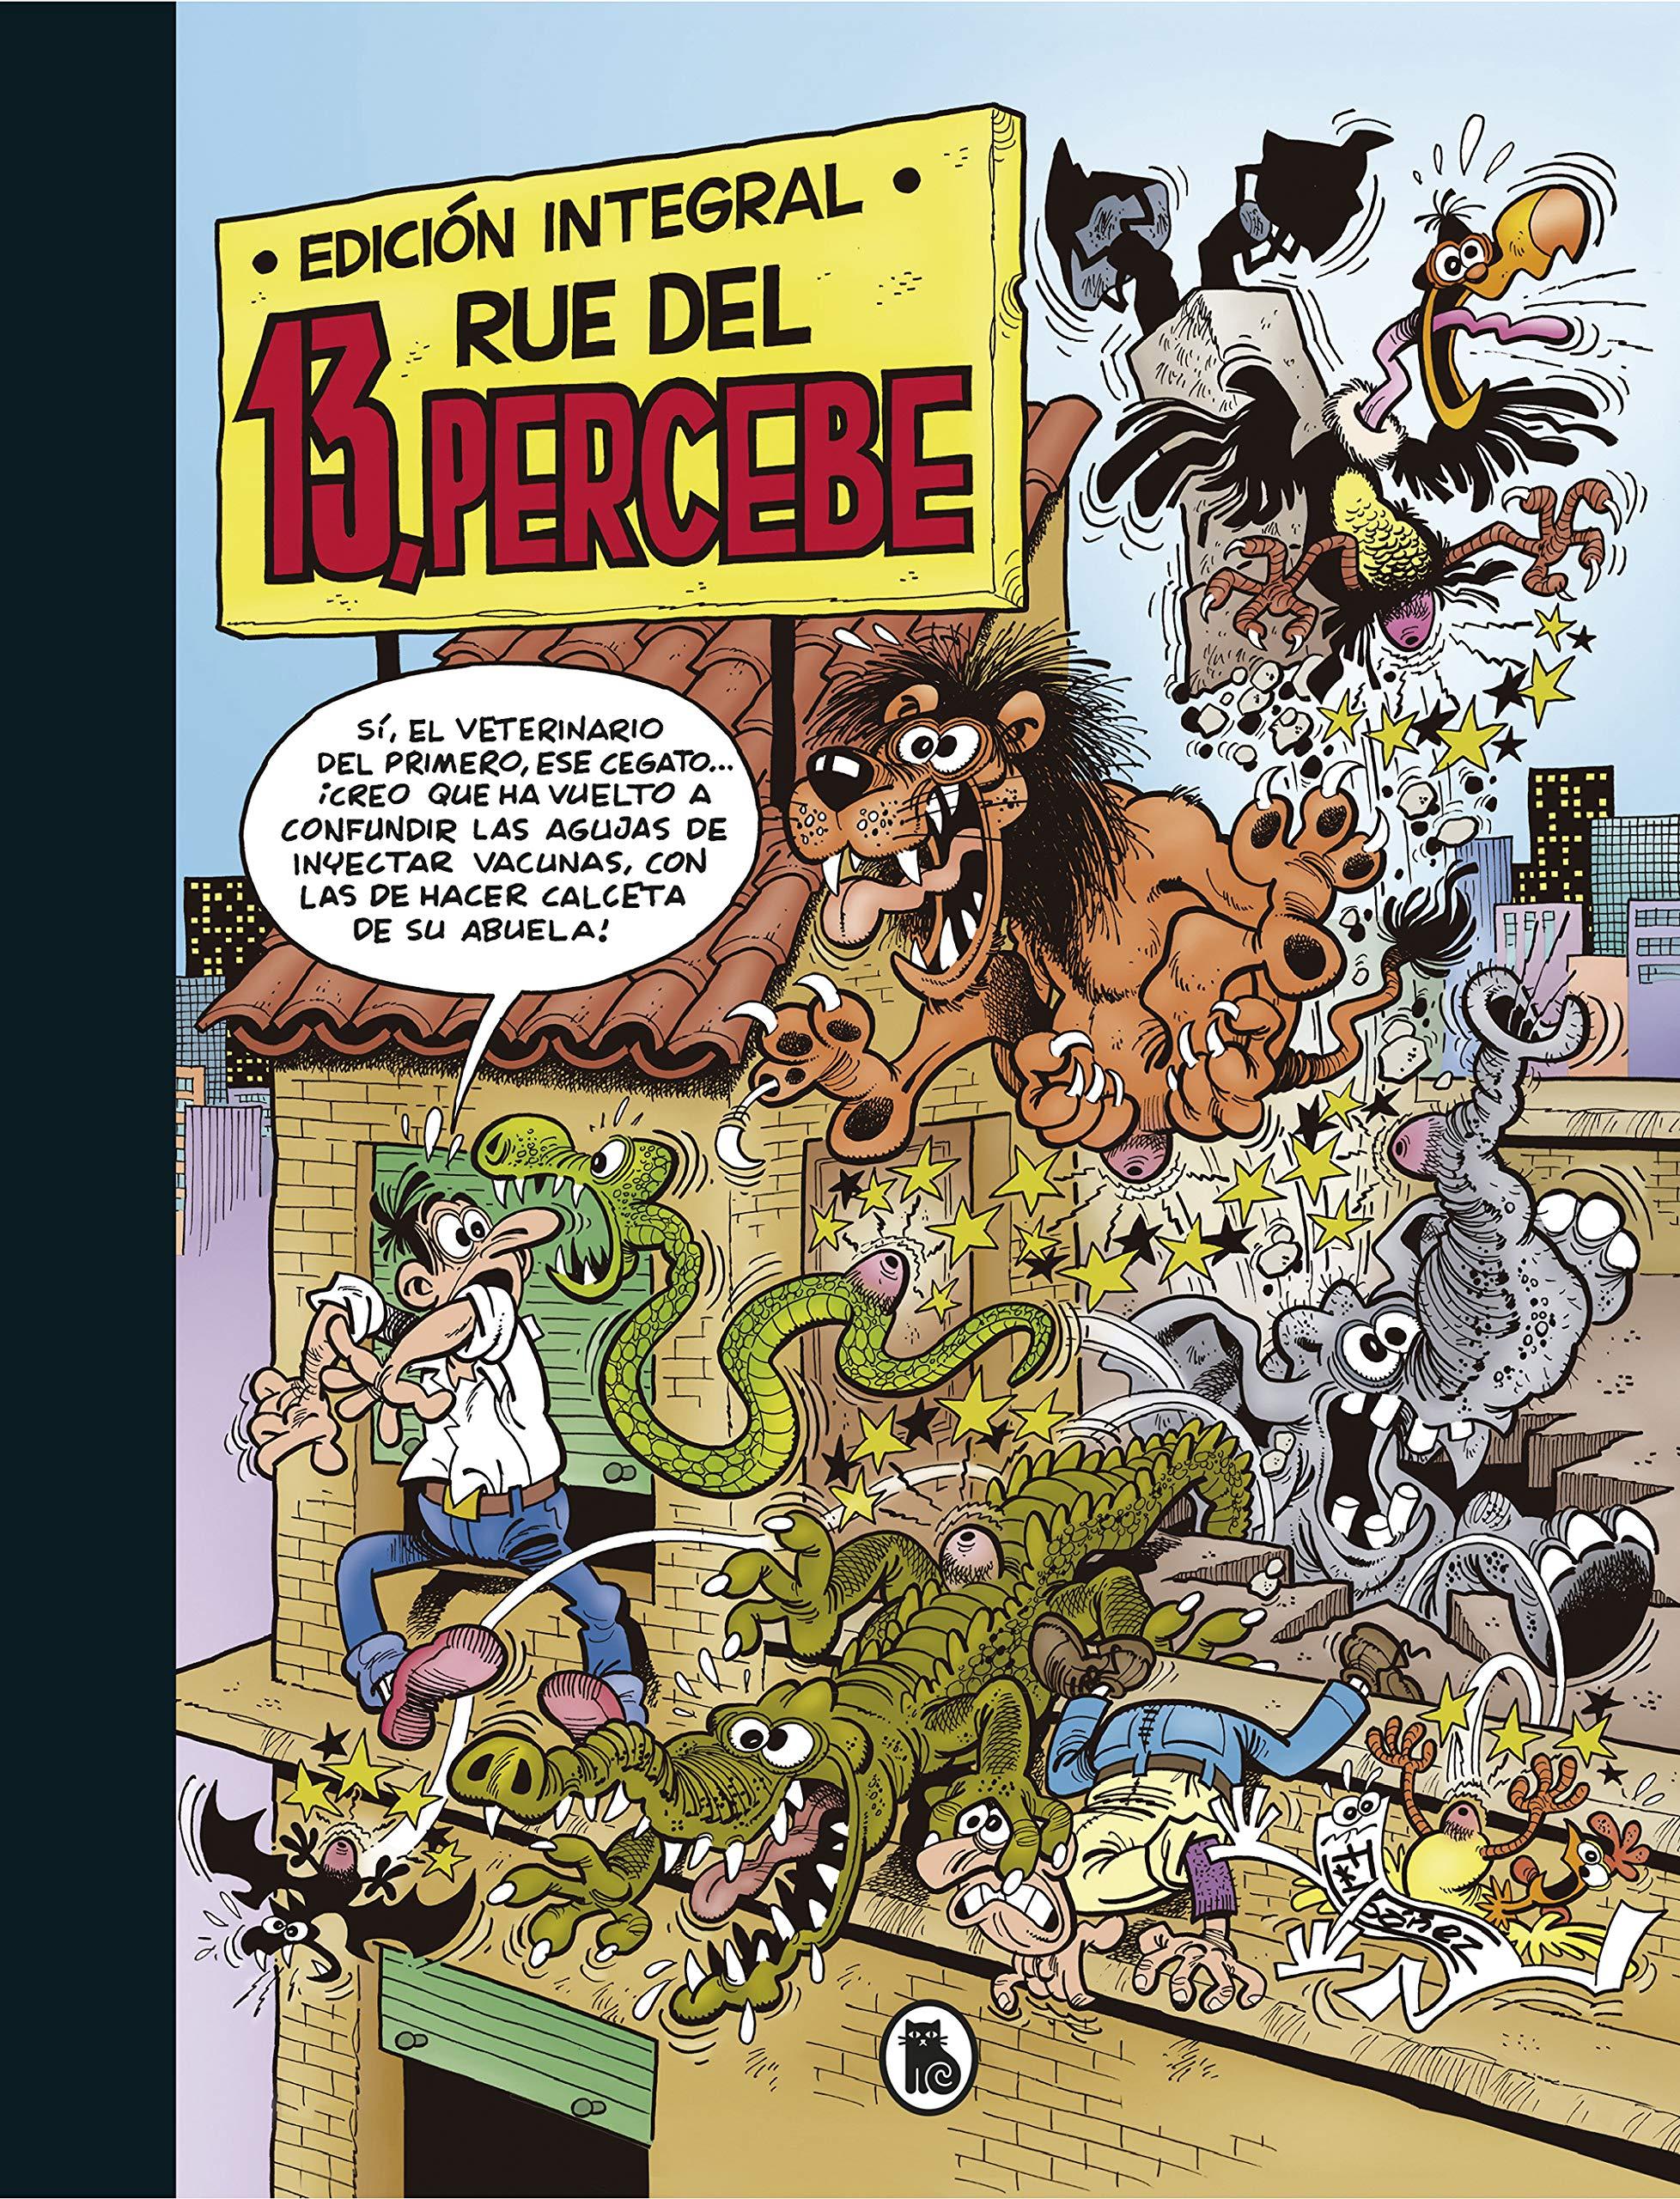 13, Rúe del Percebe (edición integral) (Bruguera Clásica) por Francisco Ibáñez